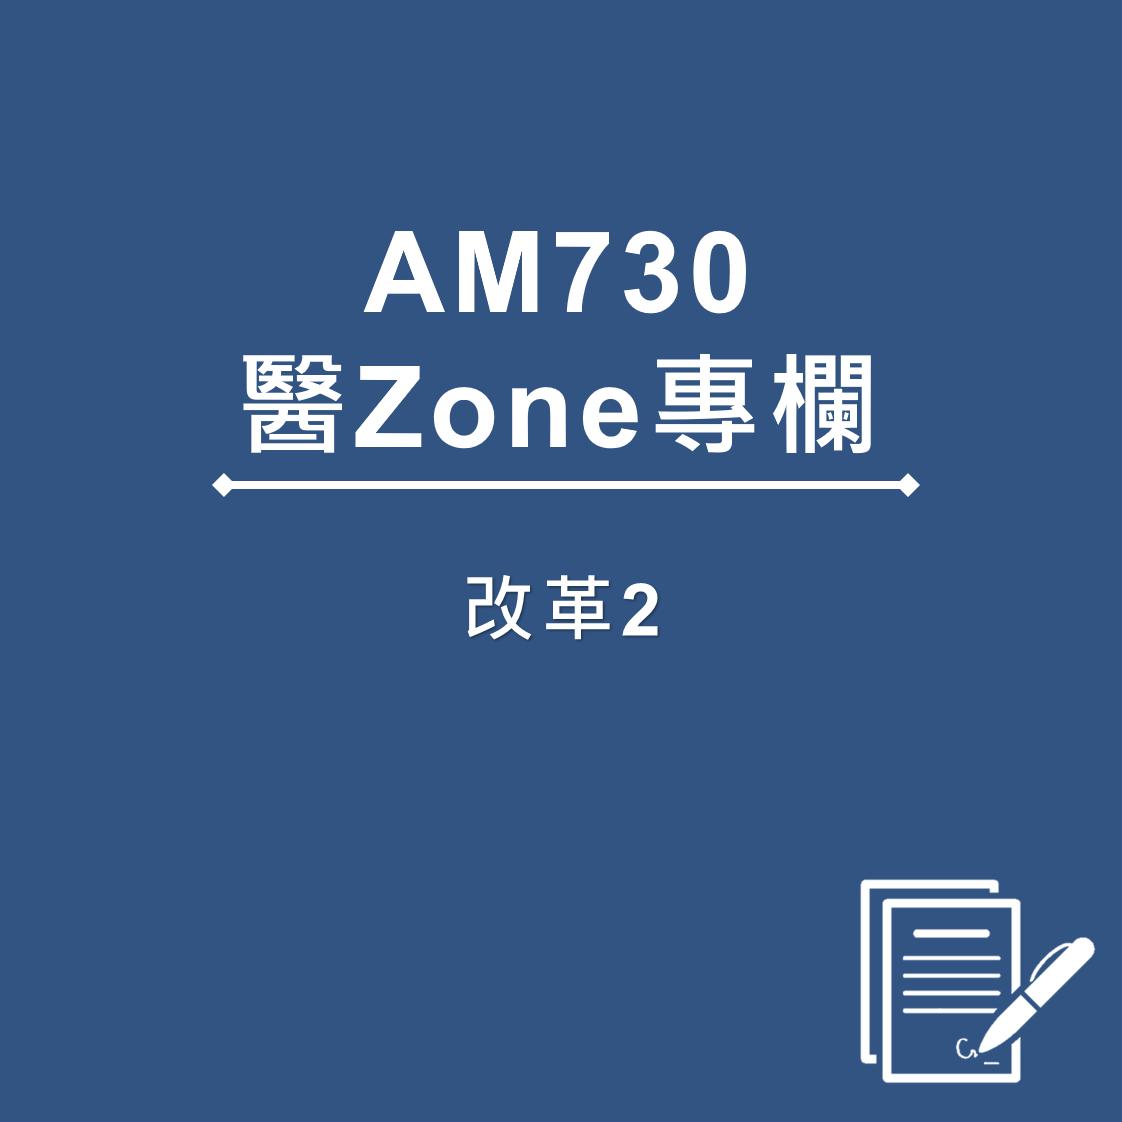 AM730 醫Zone 專欄 - 改革2